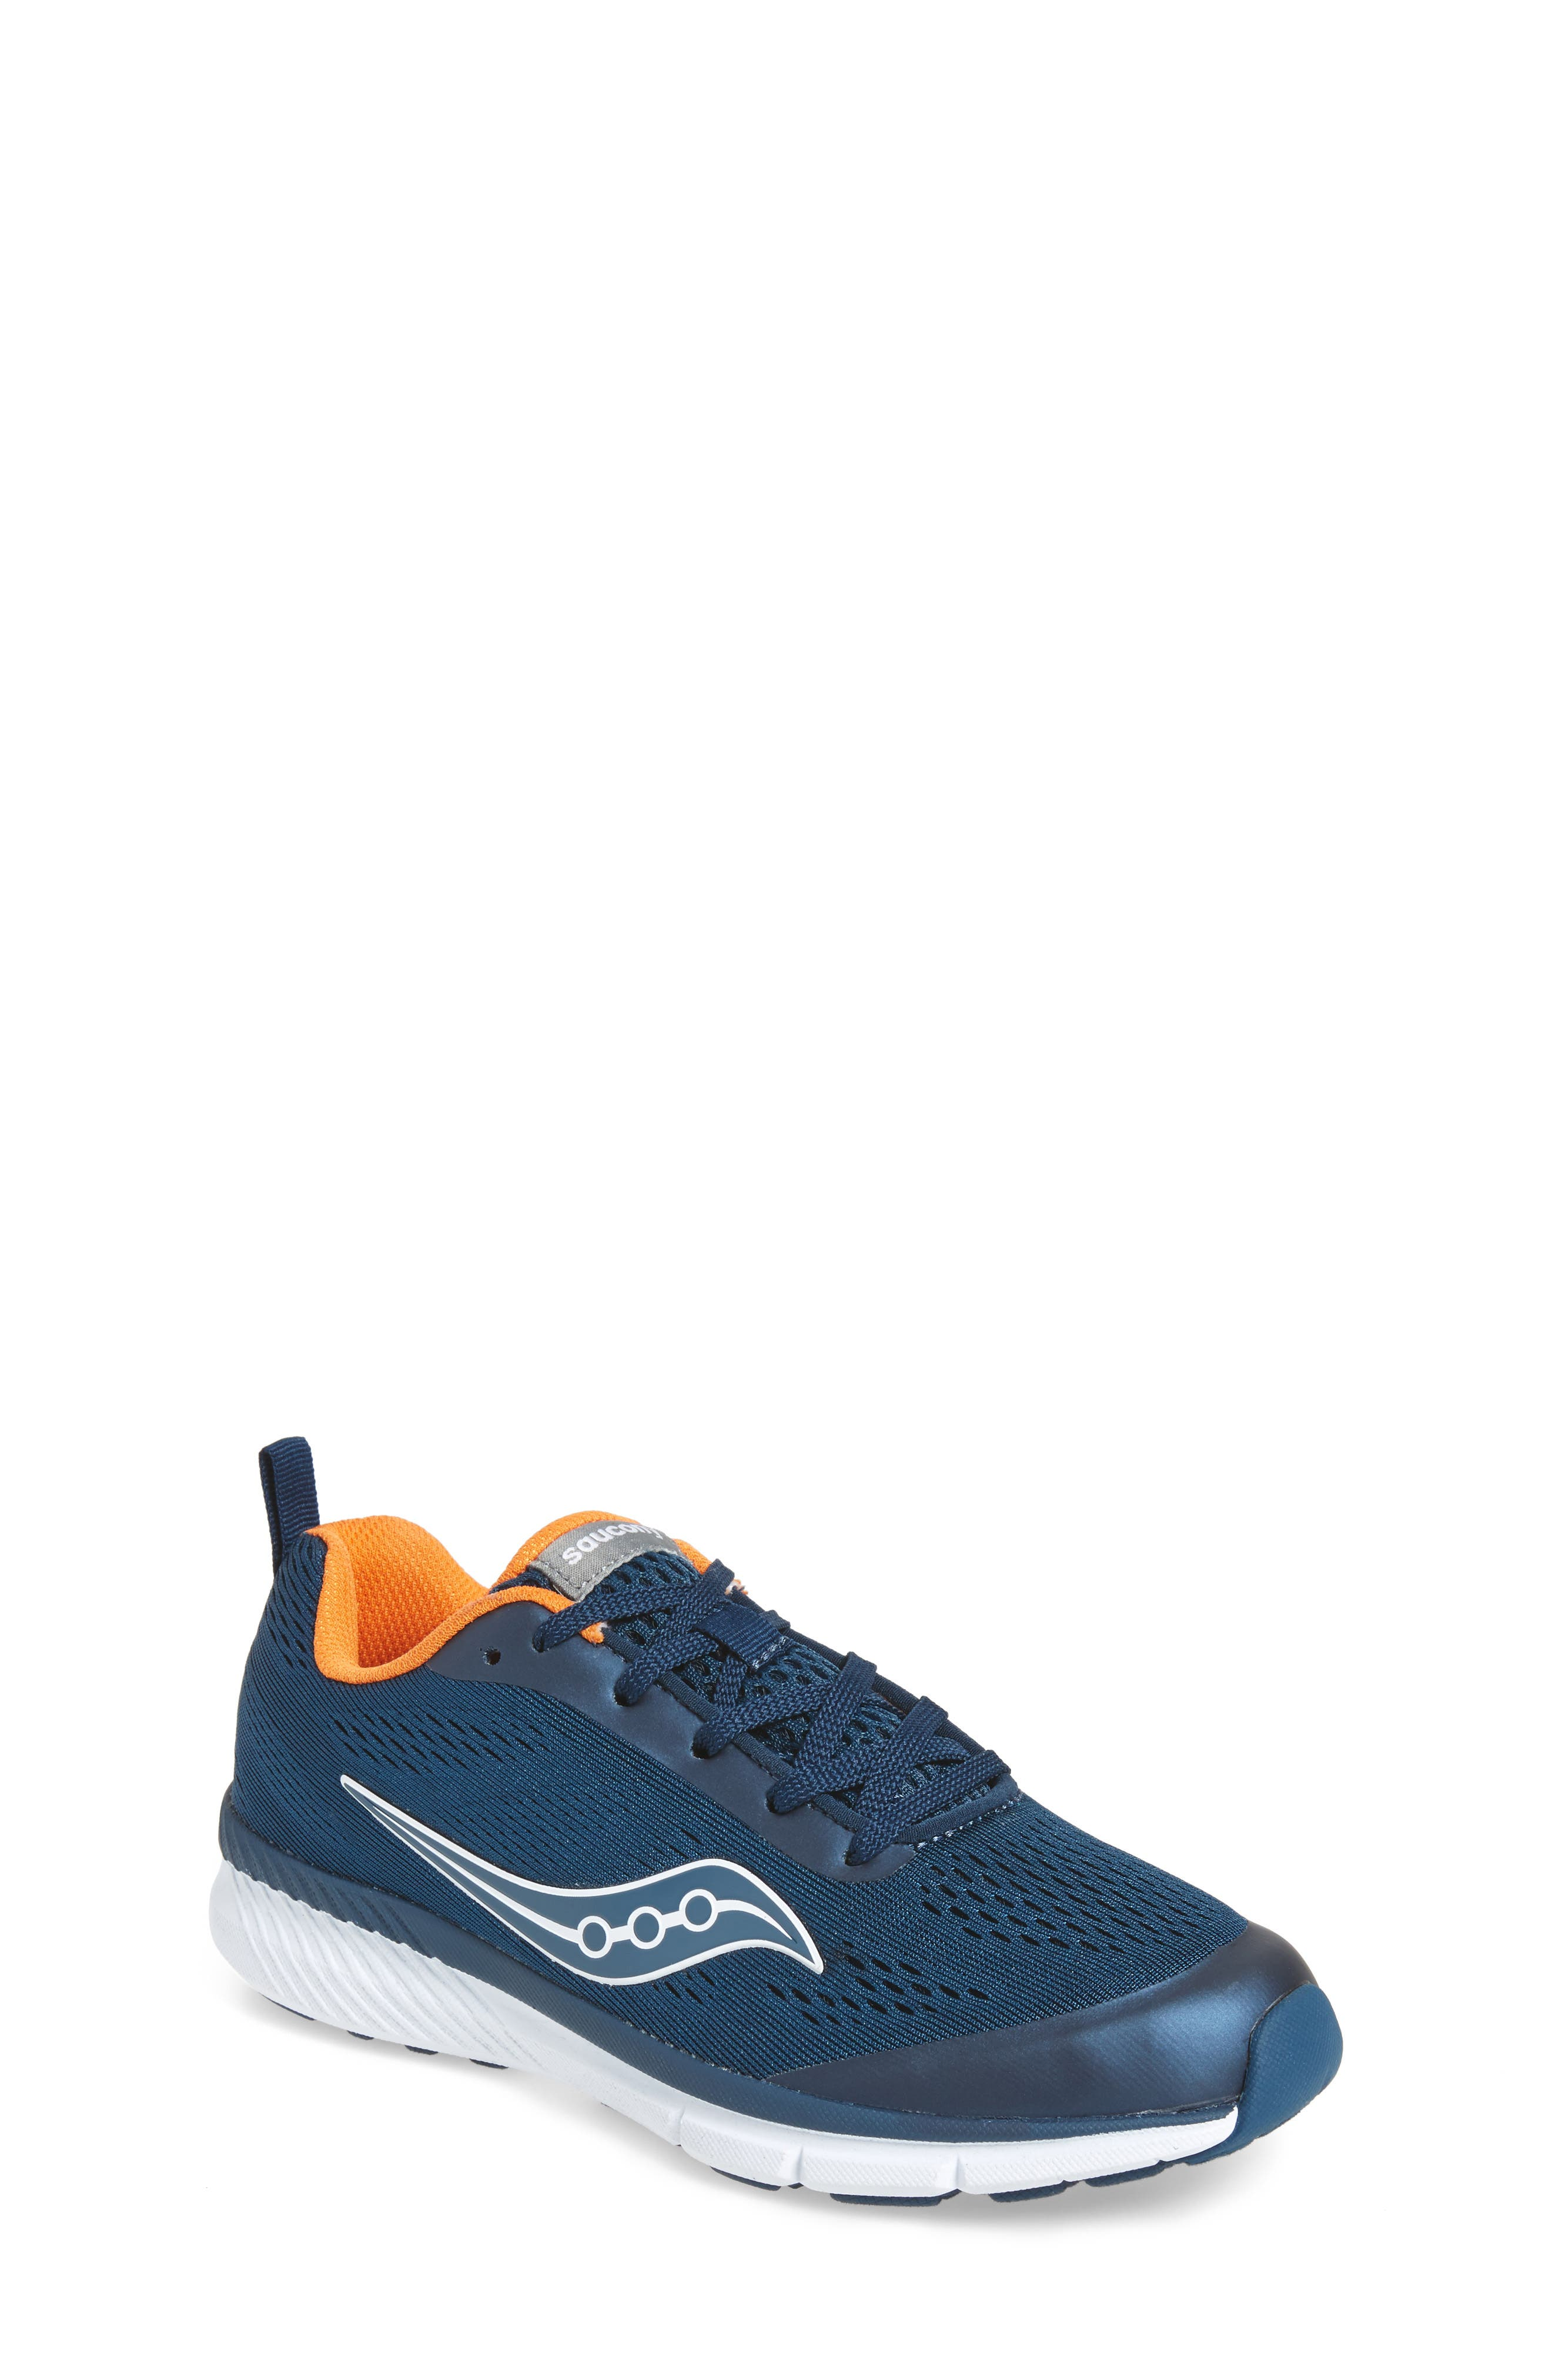 Ideal Sneaker,                             Main thumbnail 1, color,                             410